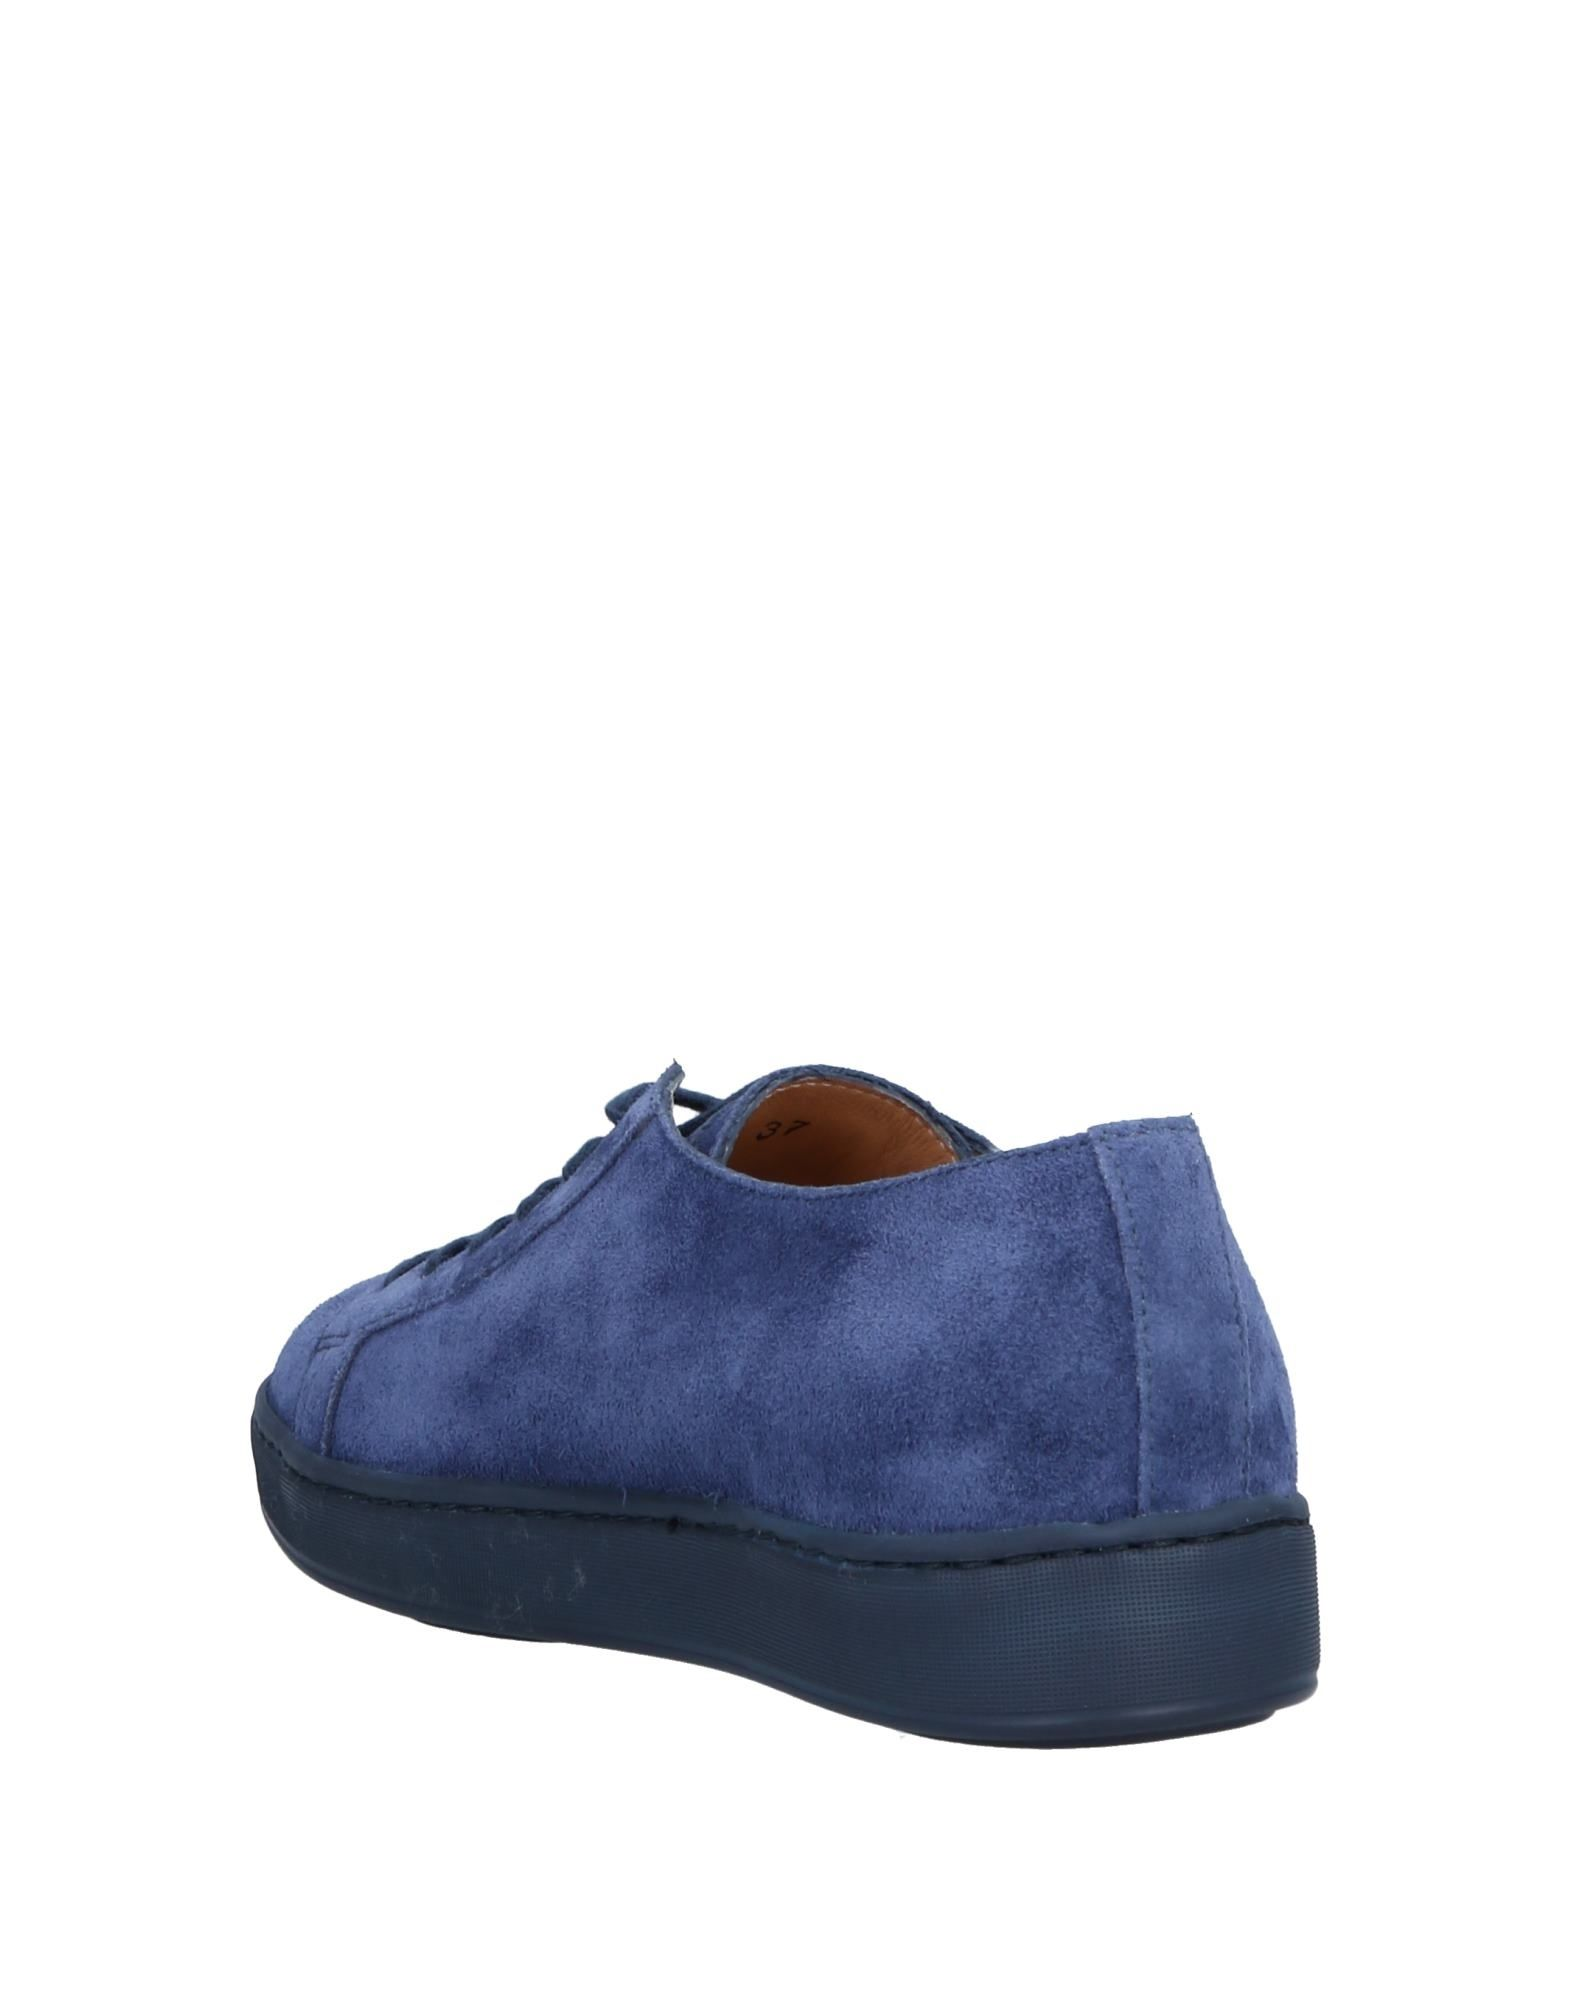 Santoni Sneakers Damen Gutes Preis-Leistungs-Verhältnis, Preis-Leistungs-Verhältnis, Gutes es lohnt sich d55540